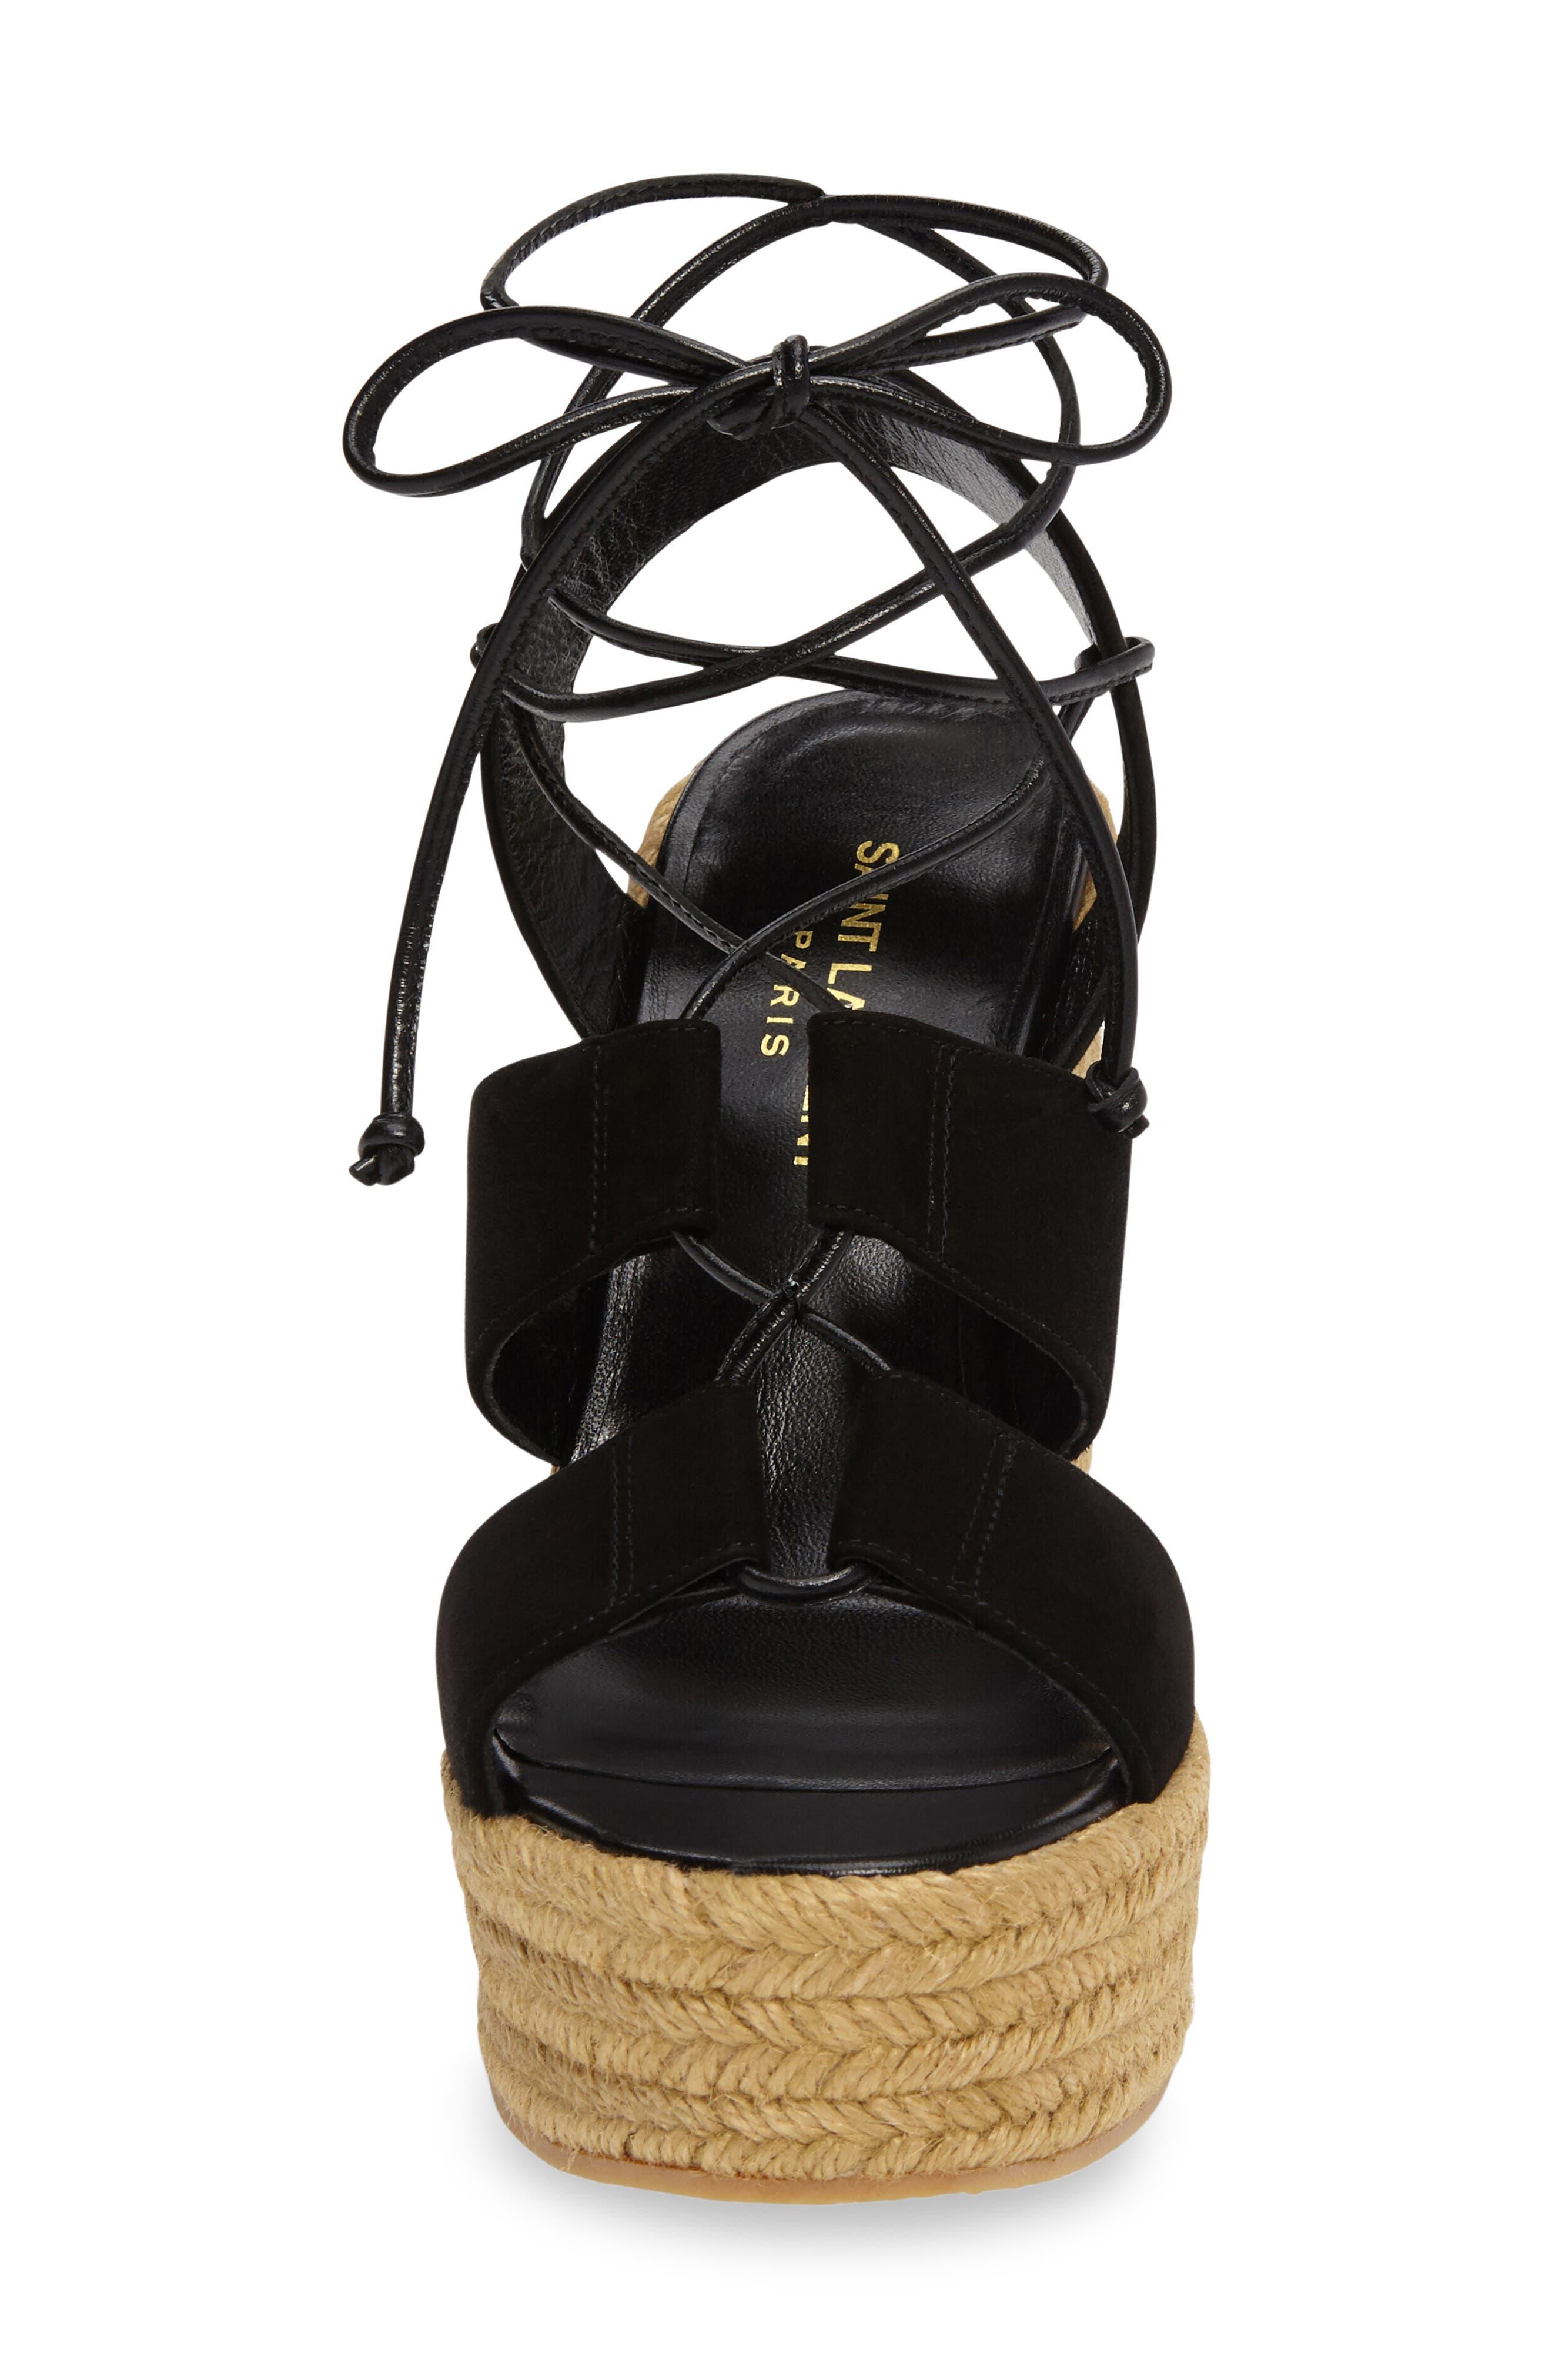 Woven Espadrille Wedge Sandal,                             Alternate thumbnail 4, color,                             001